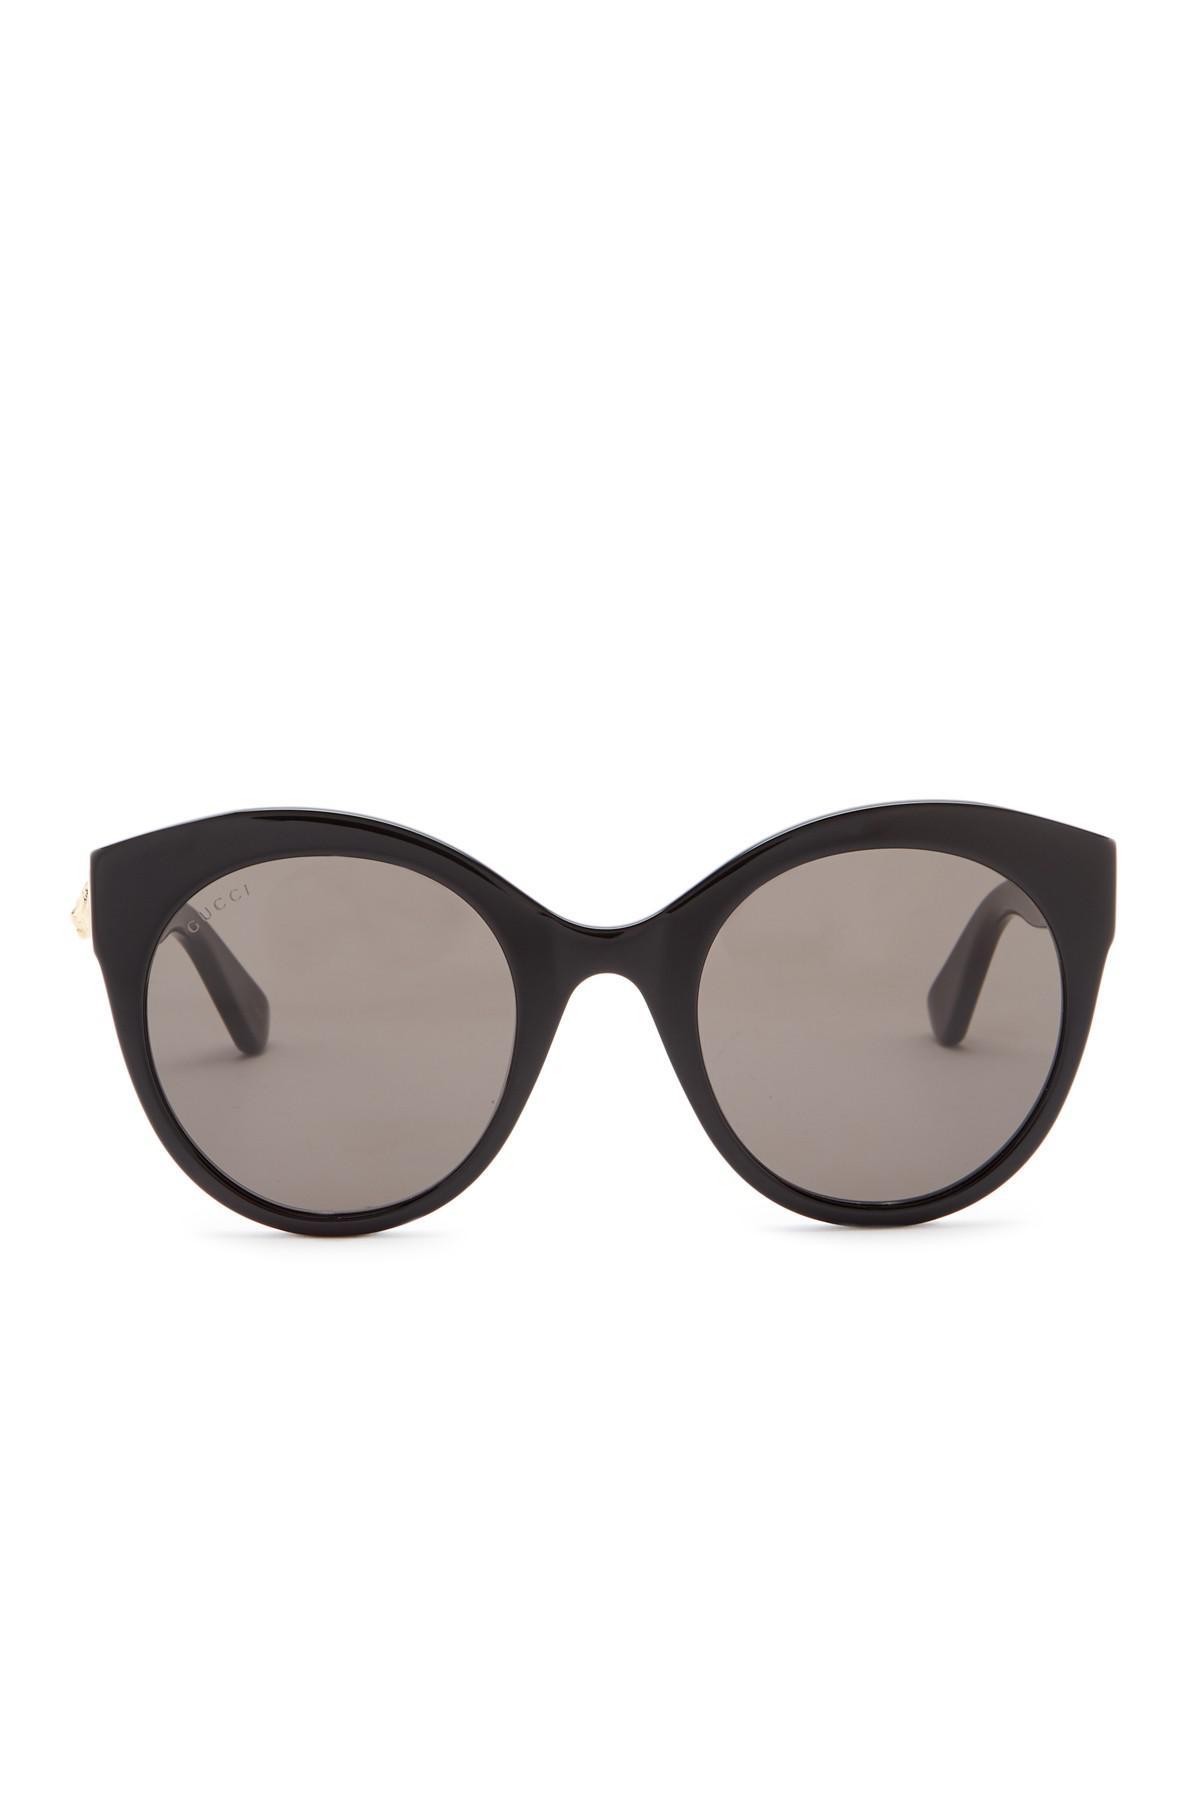 891b542b6c5 Gucci - Black 52mm Round Cat Eye Sunglasses - Lyst. View fullscreen